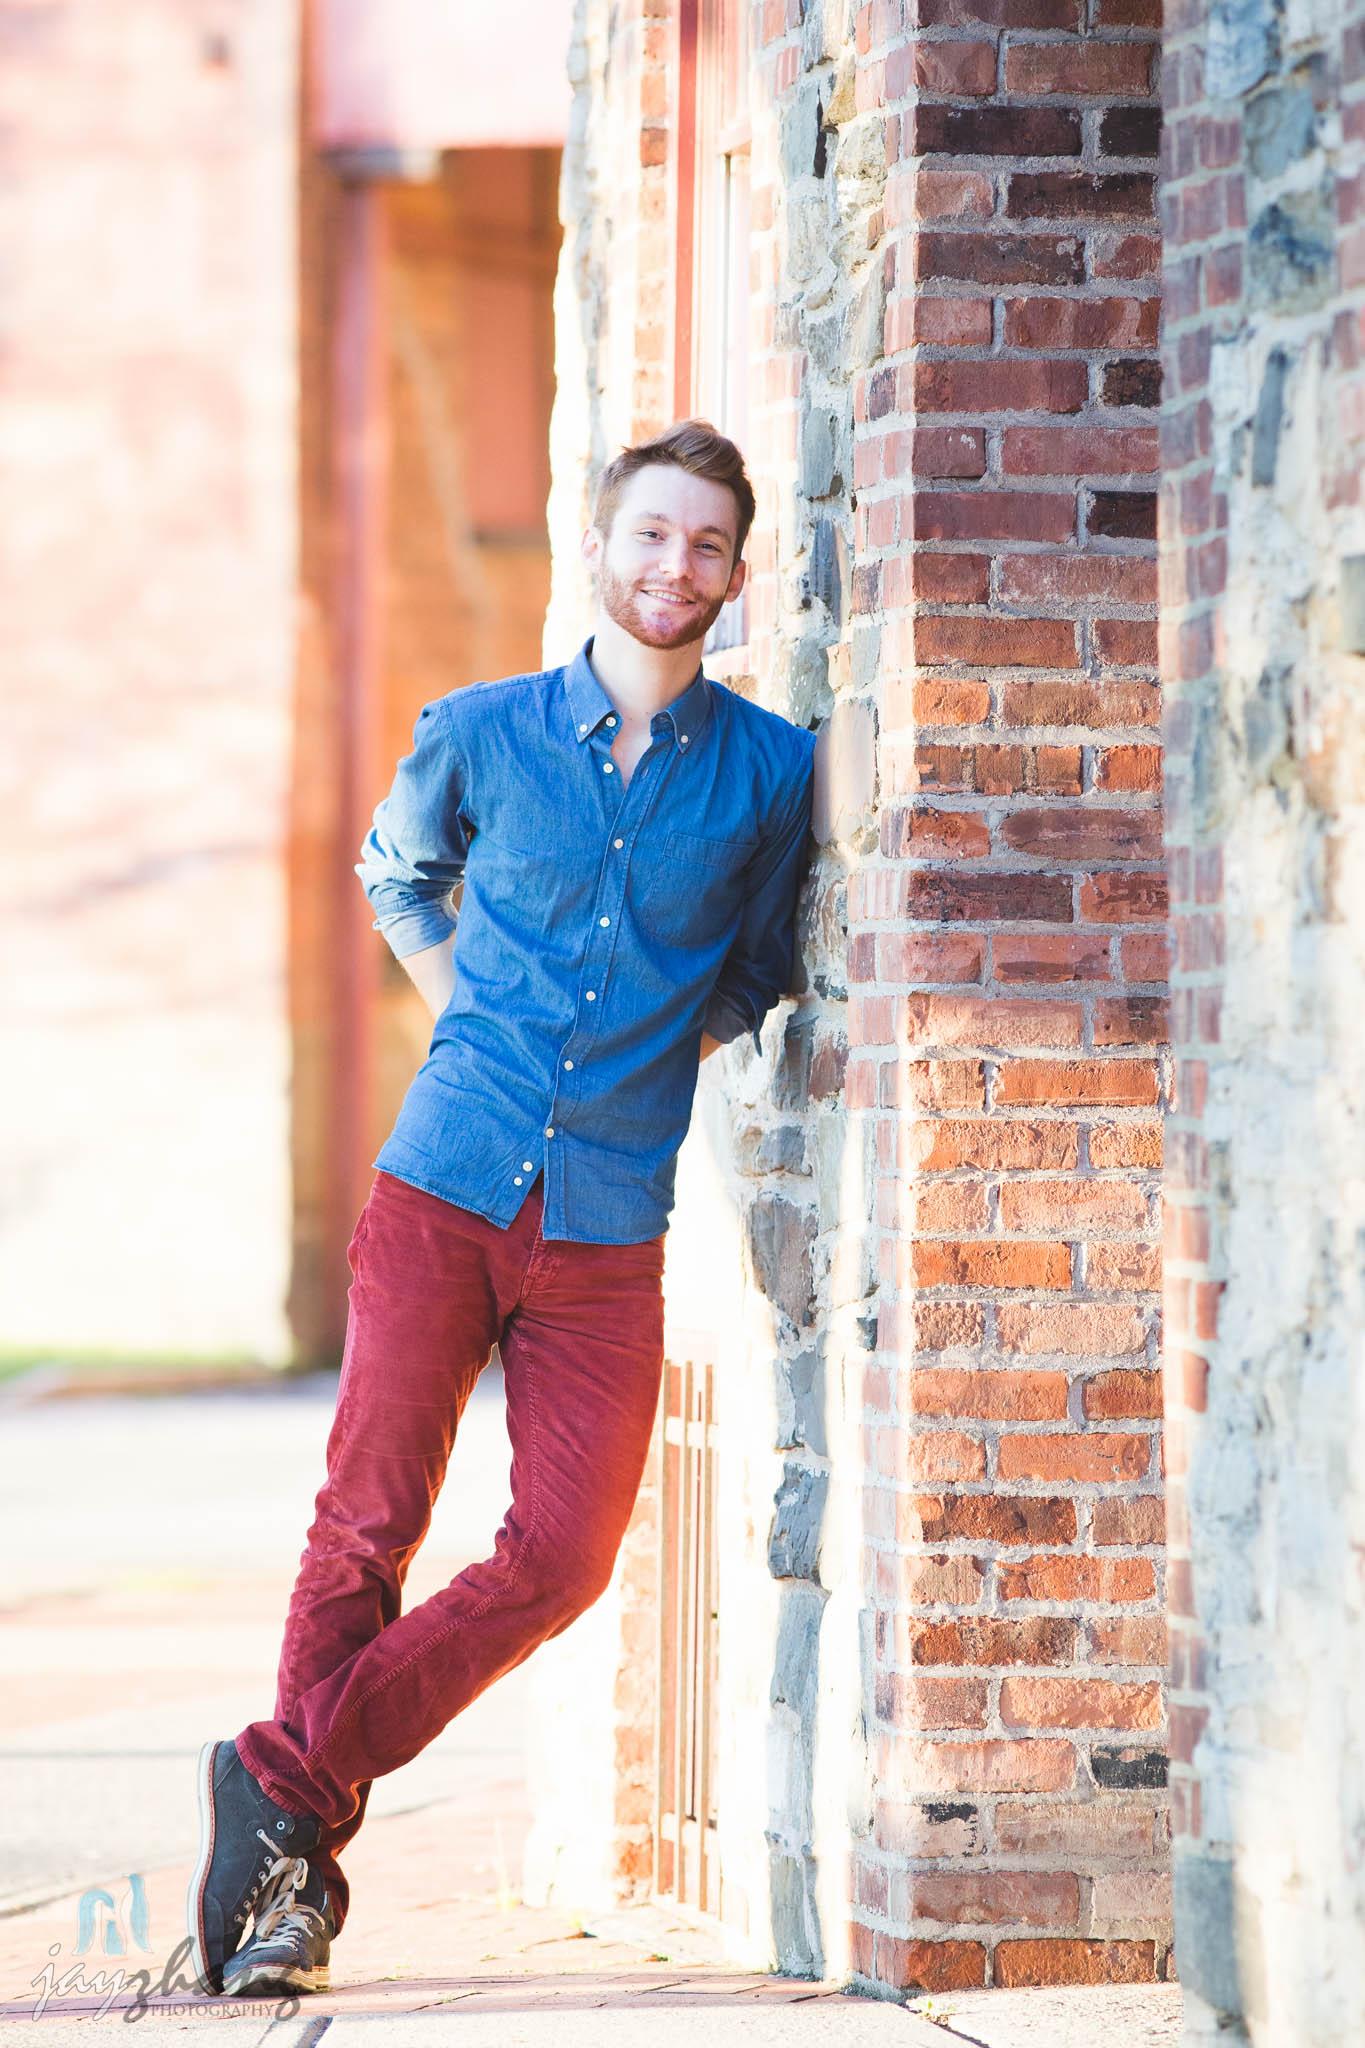 Albany_Portrait_Photographer-10.jpg